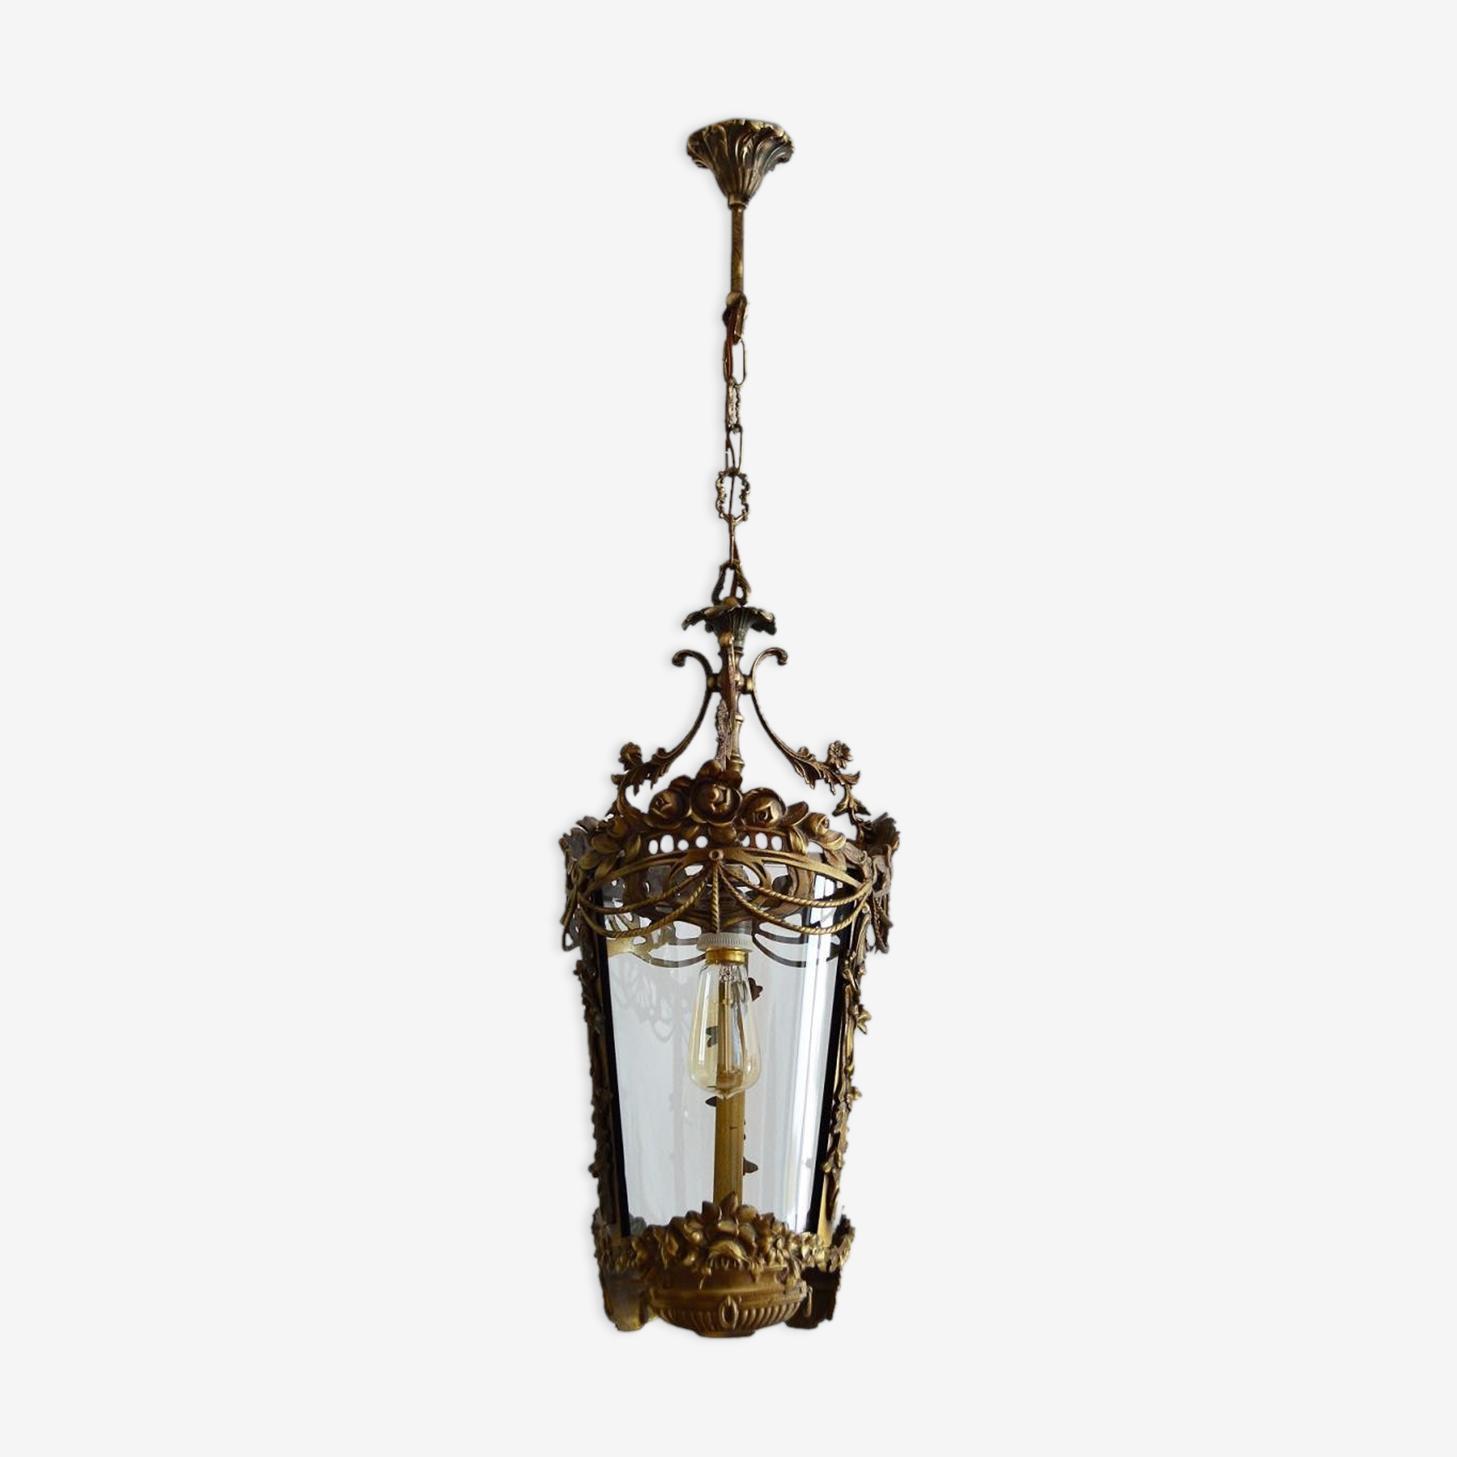 Lanterne fleur & guirlande en bronze Italie 1950s